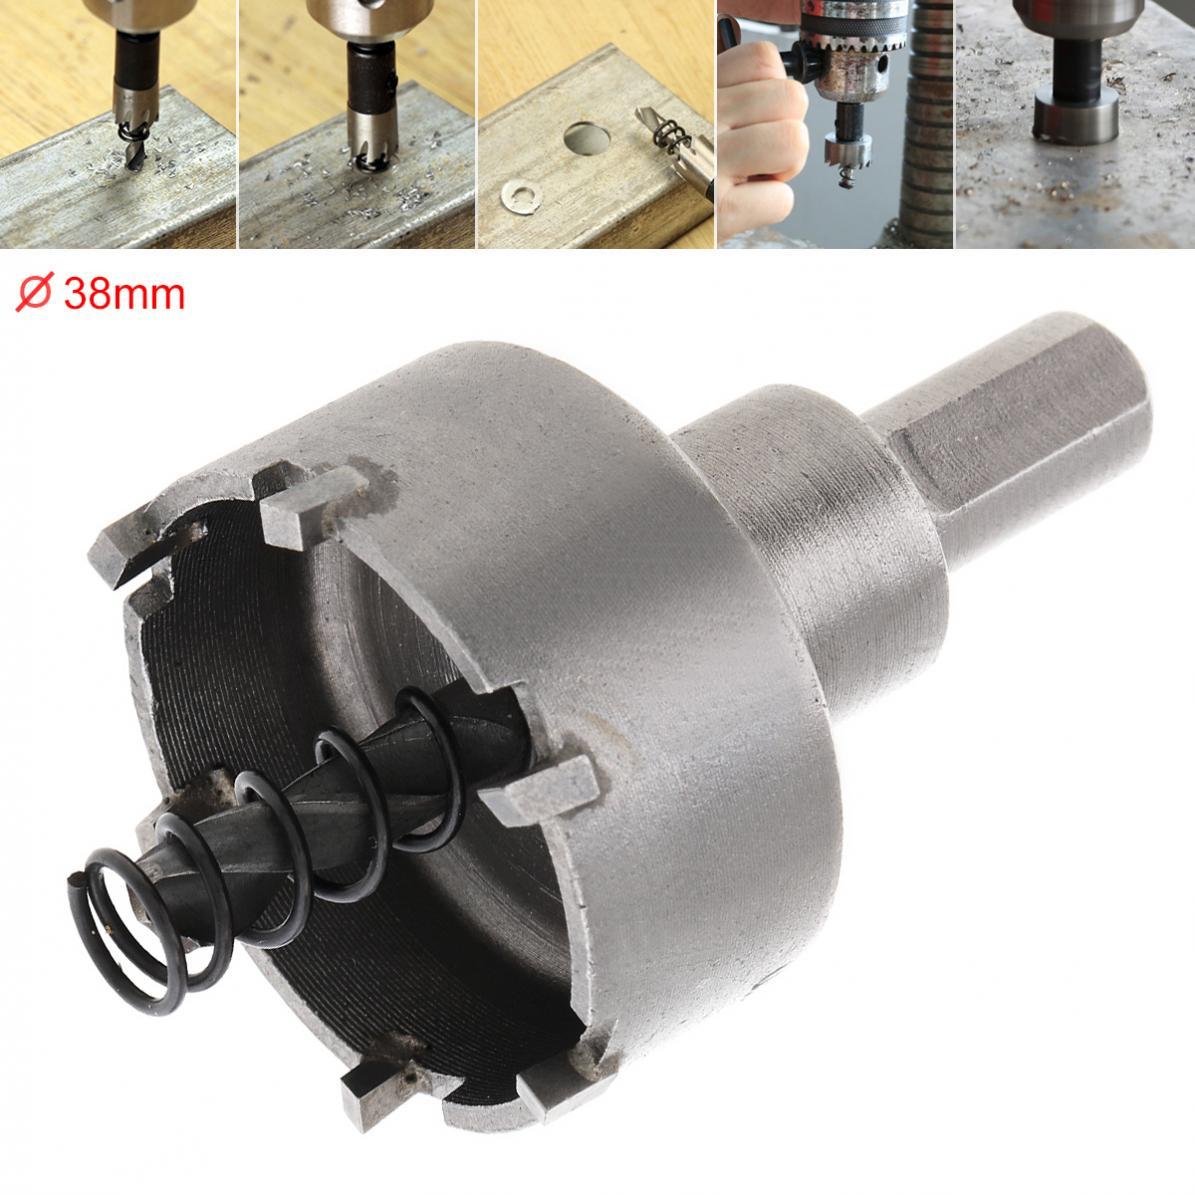 26mm HSS Hole Saw Drill Bit Cutter Tool For Metal Alloy Wood w// Hex Key Set